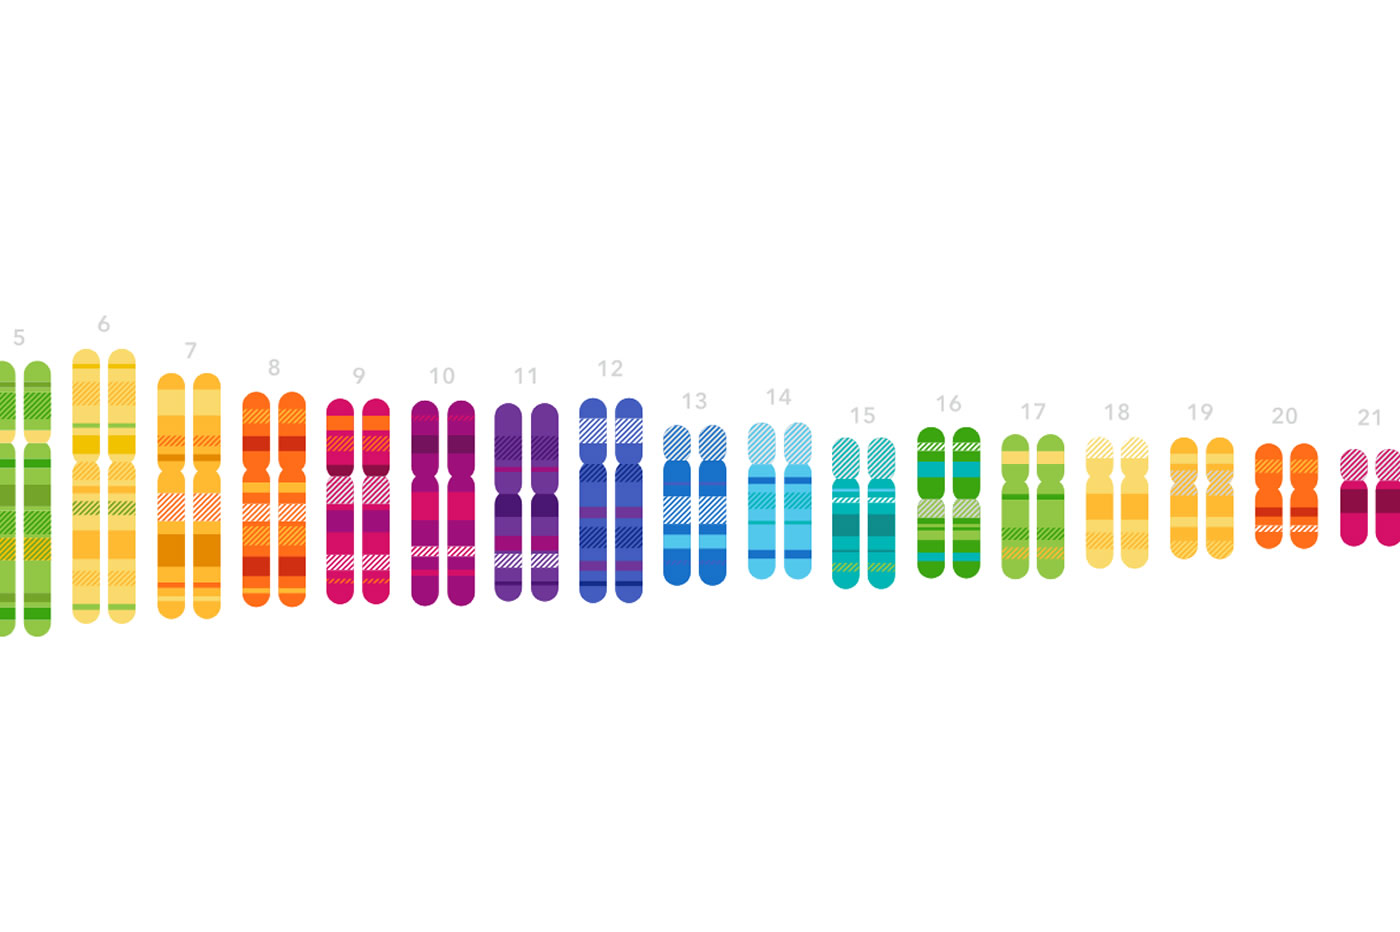 Test ADN Pentagone 23andMe